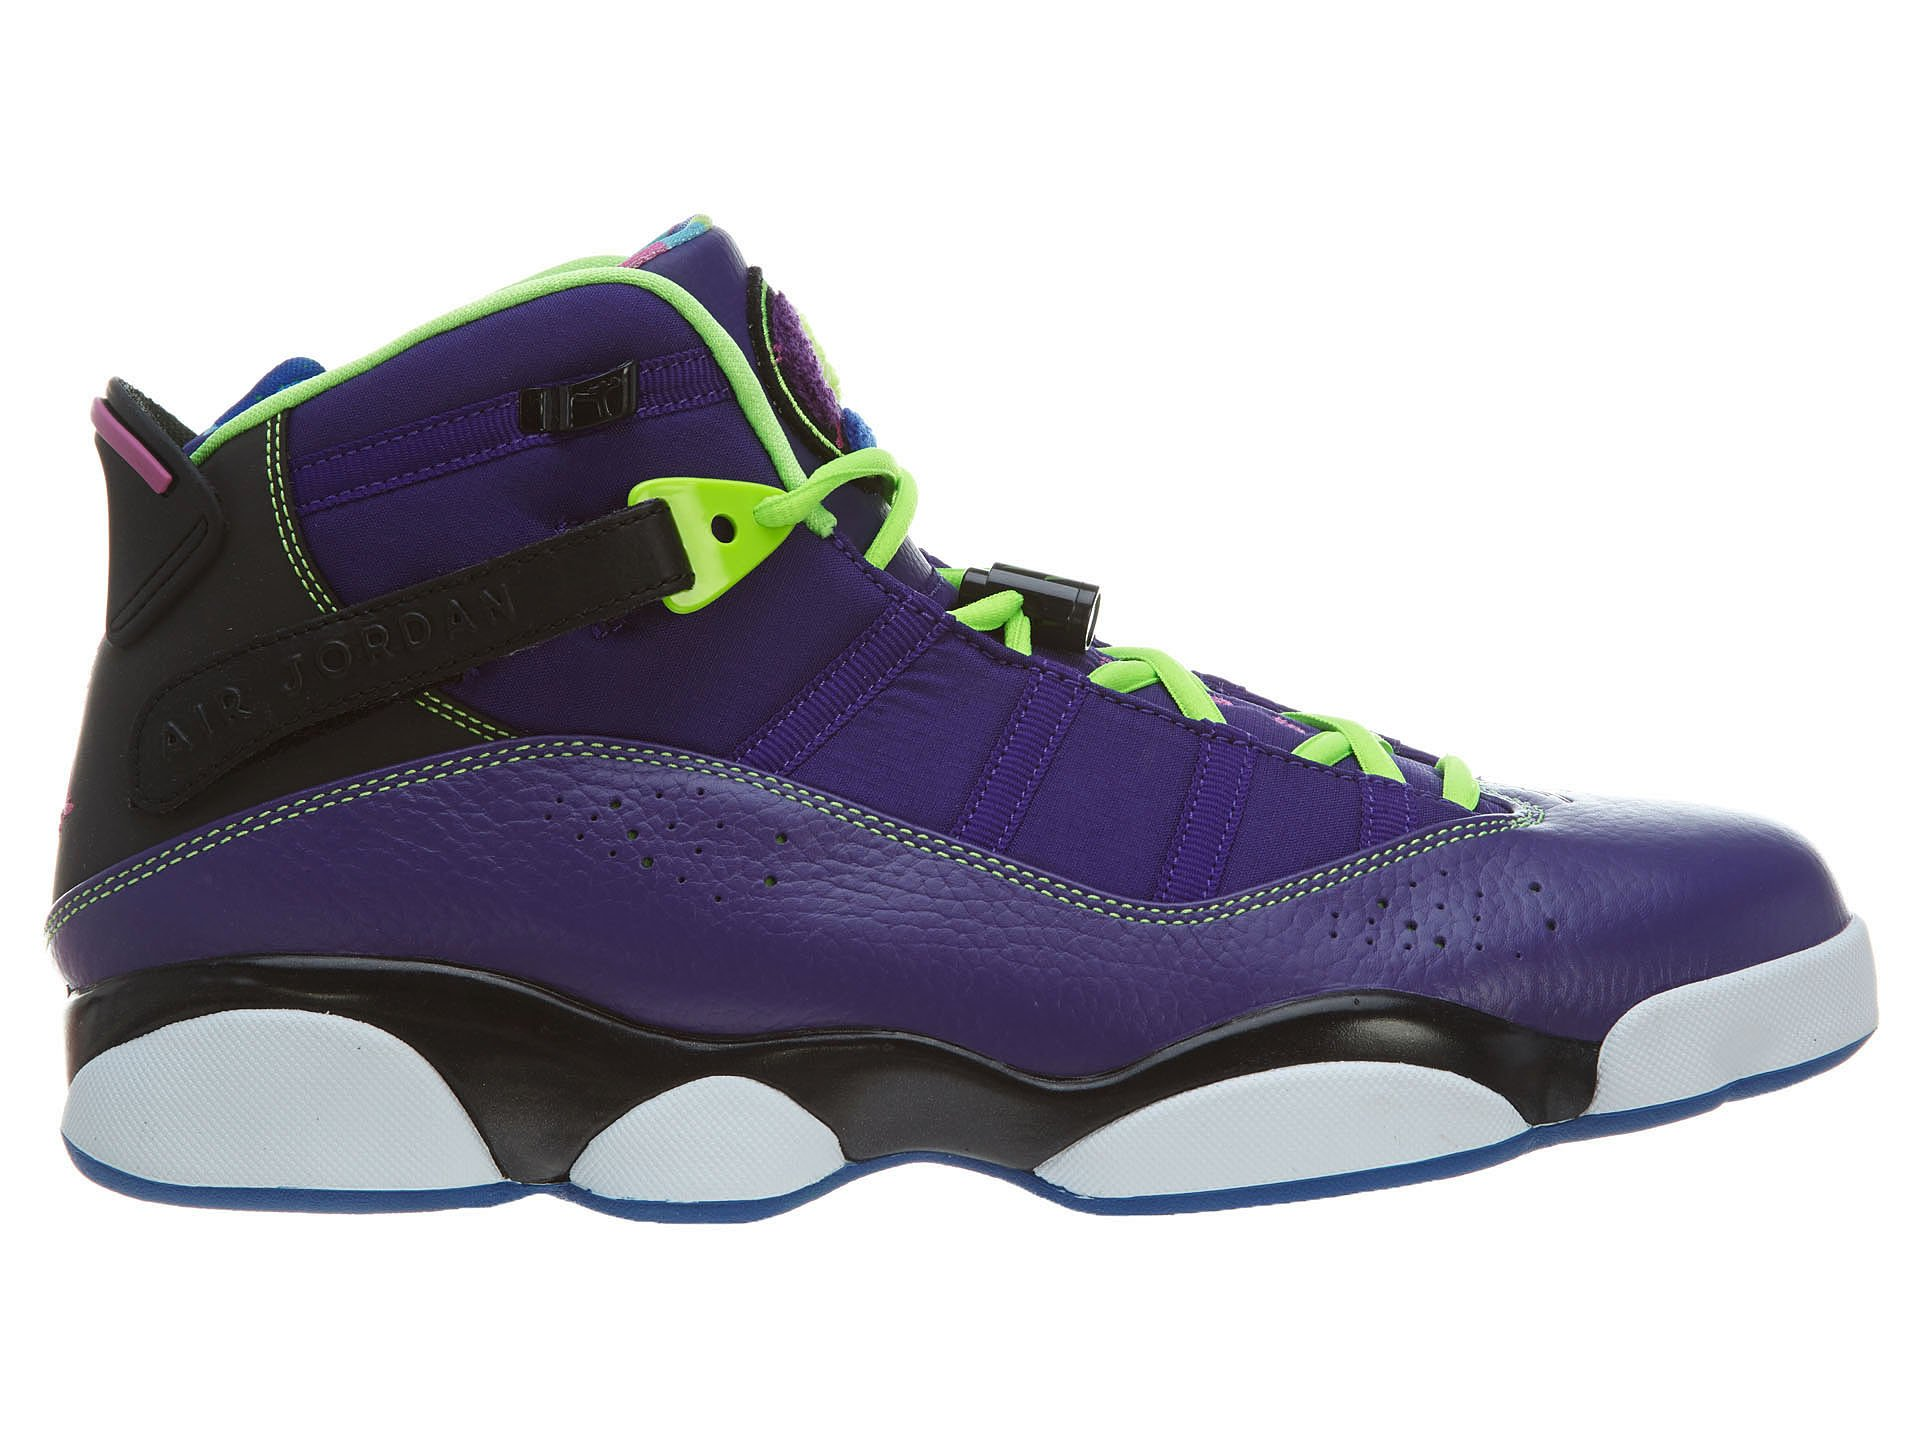 Jordan Six Rings (Bel Air) Court Purple/Club Pink-Blk-Flash Lm (11.5) by Jordan